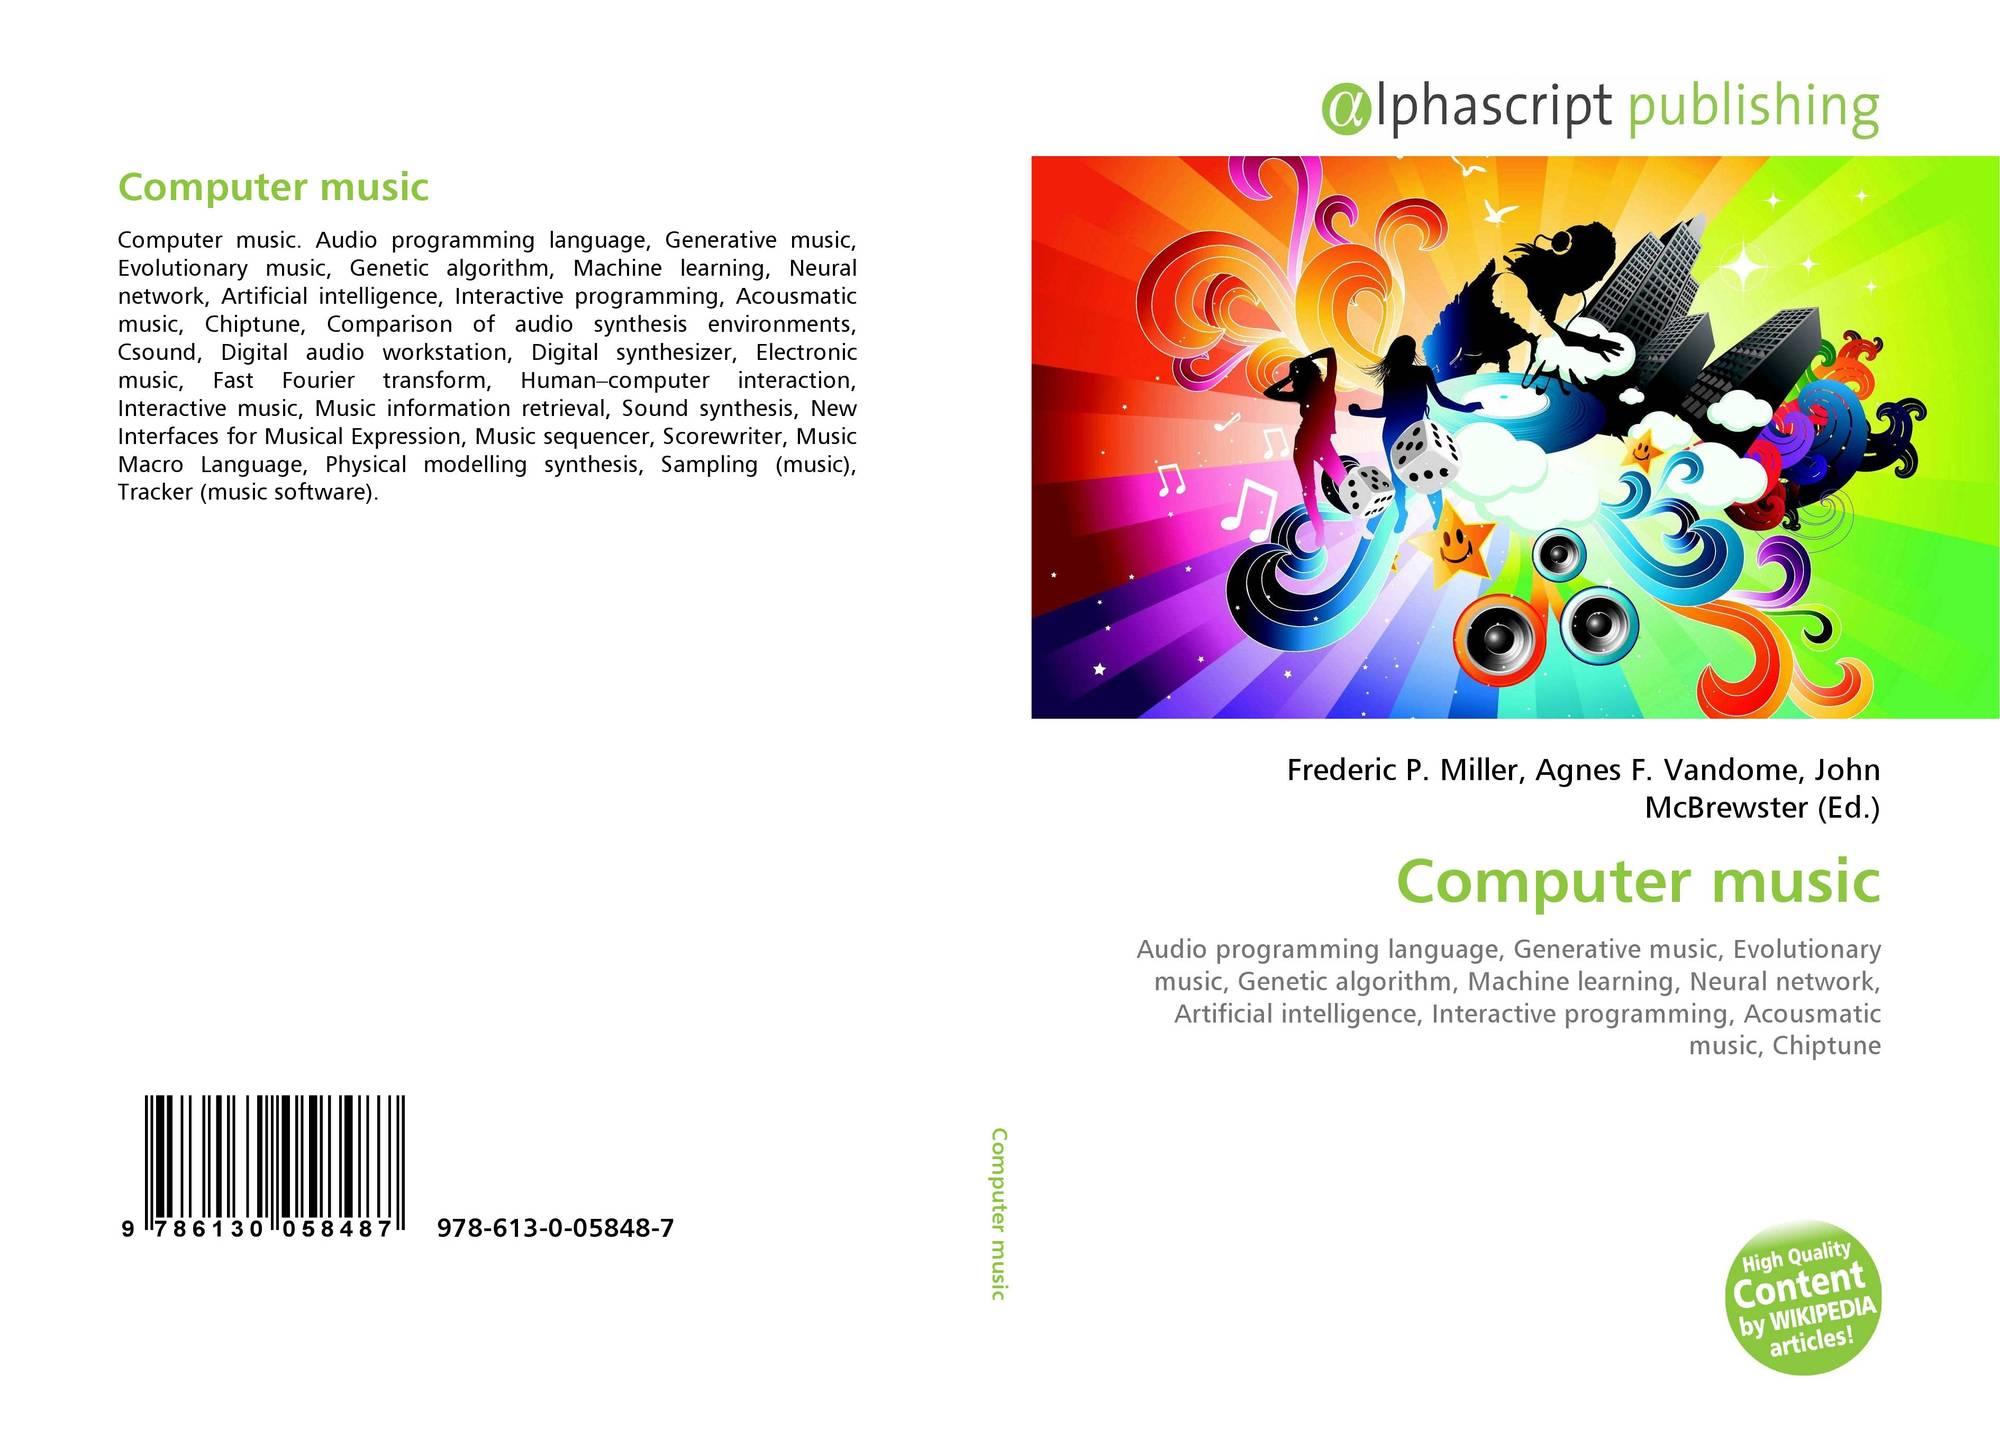 Computer music, 978-613-0-05848-7, 6130058489 ,9786130058487